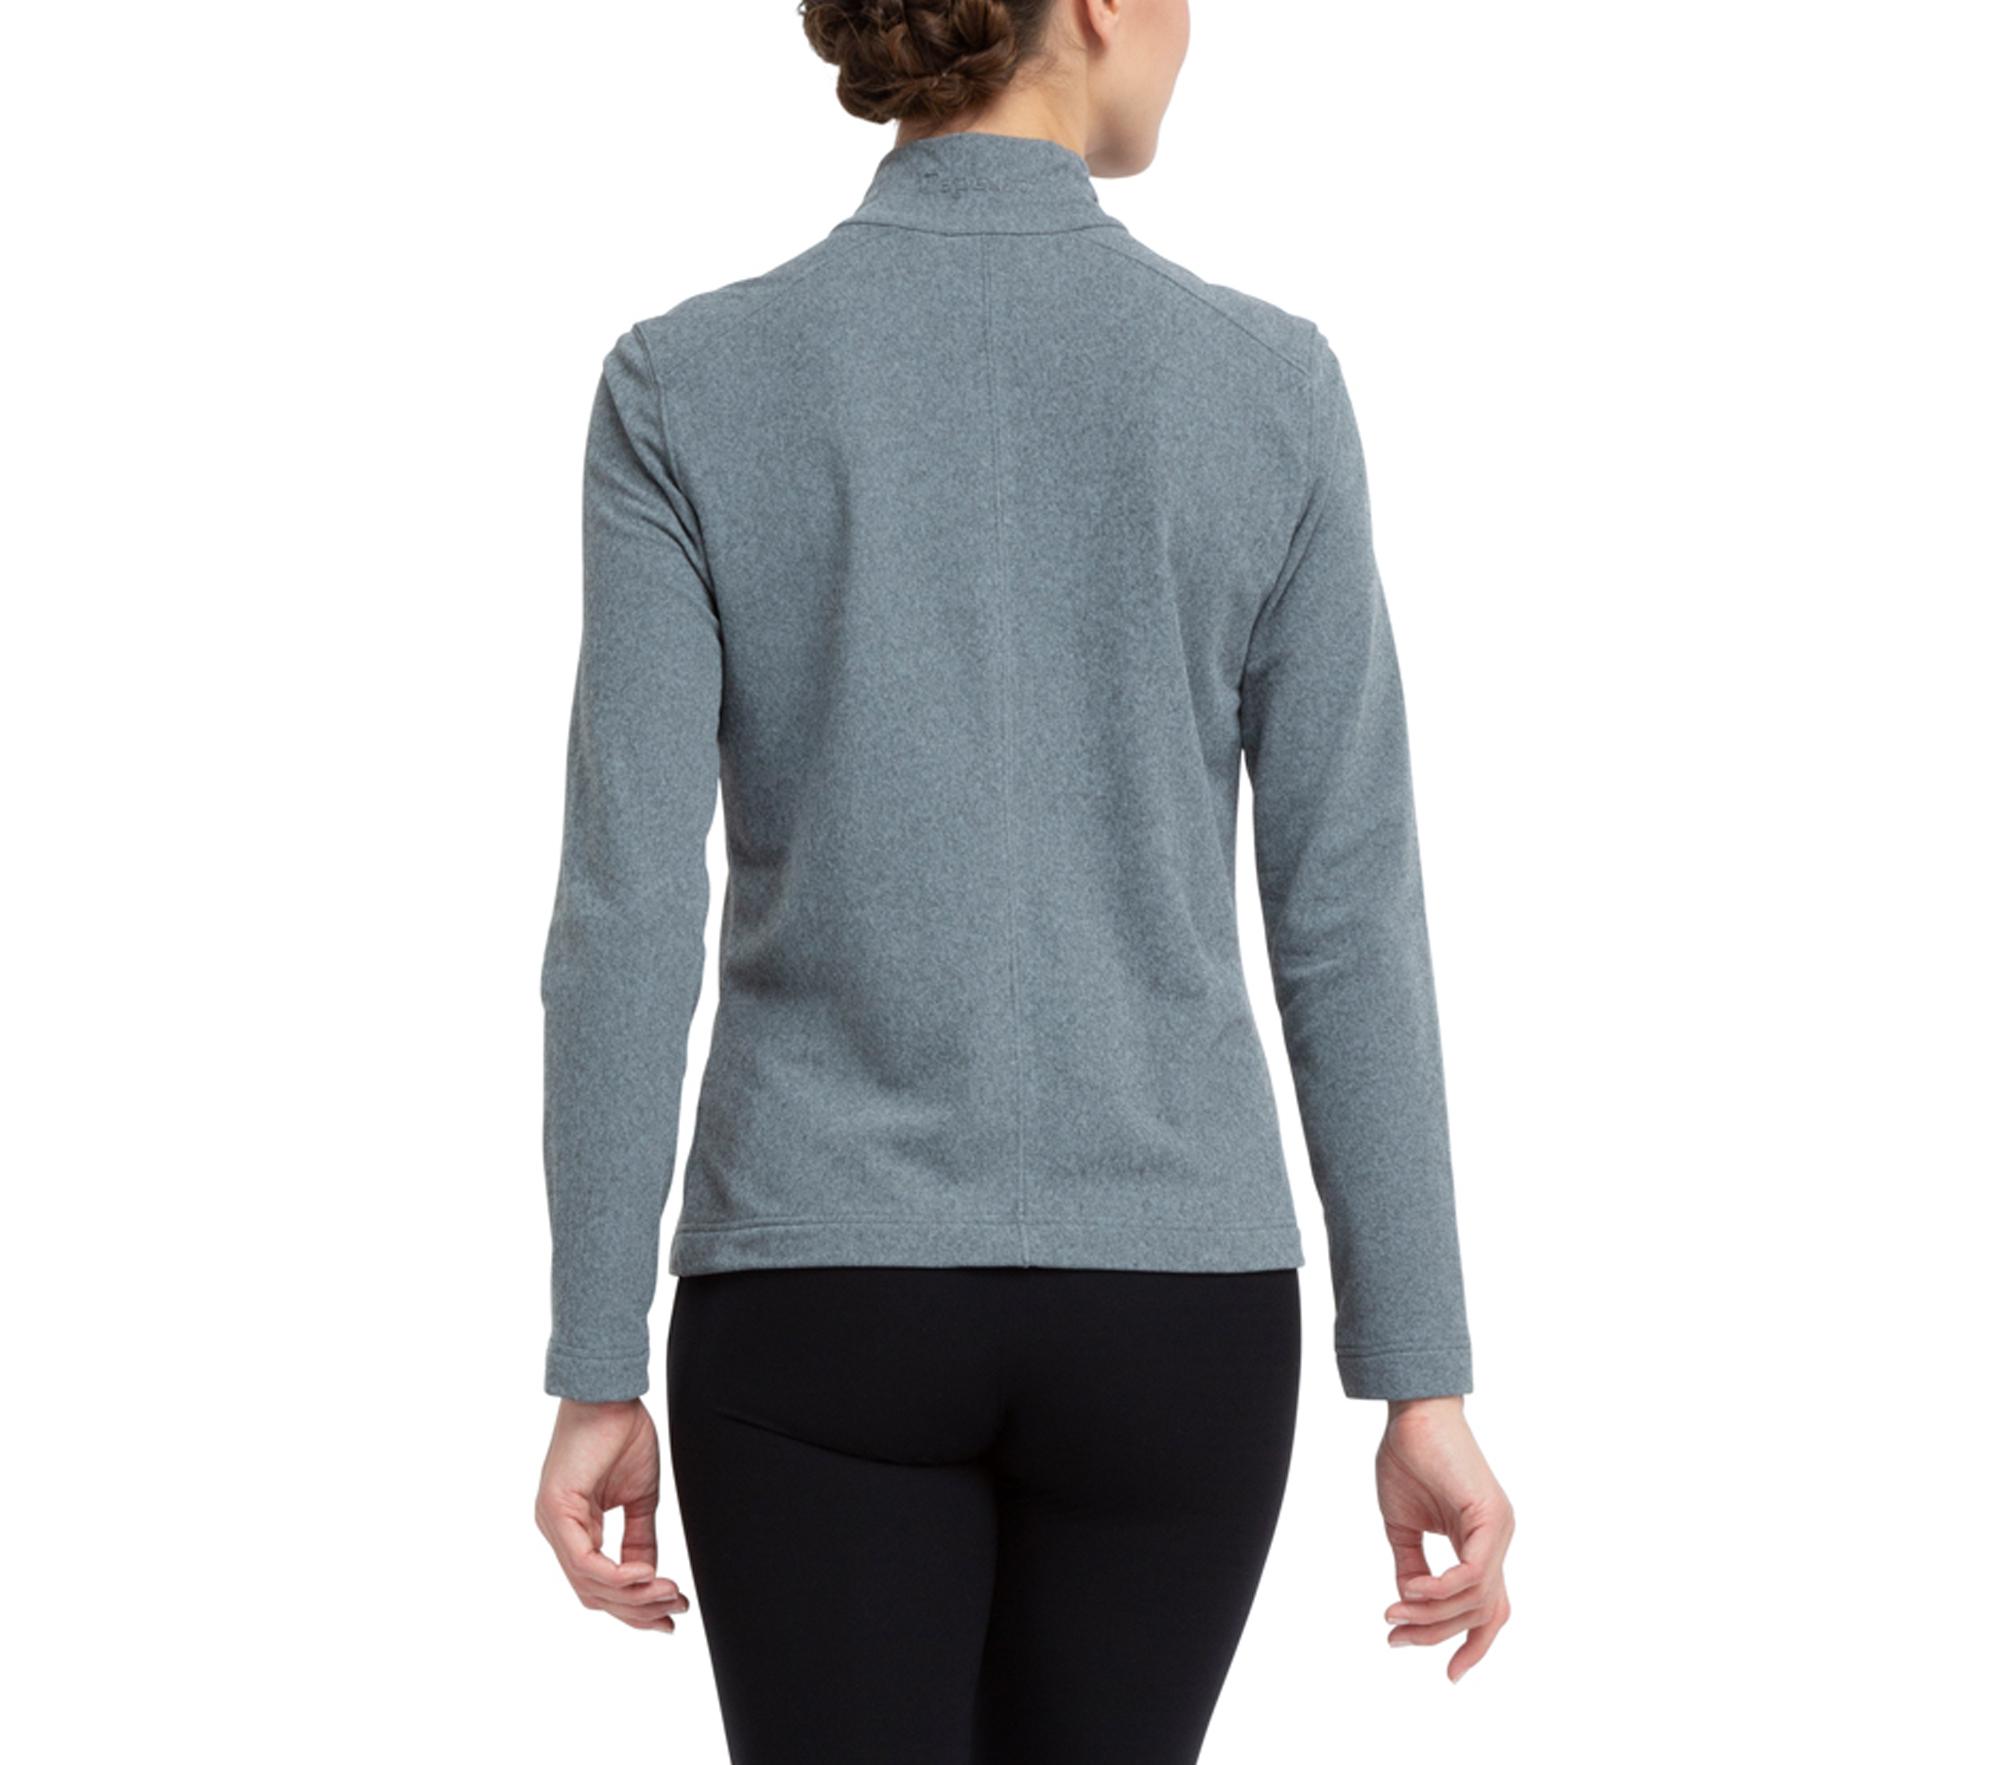 Power-stretch technical jacket